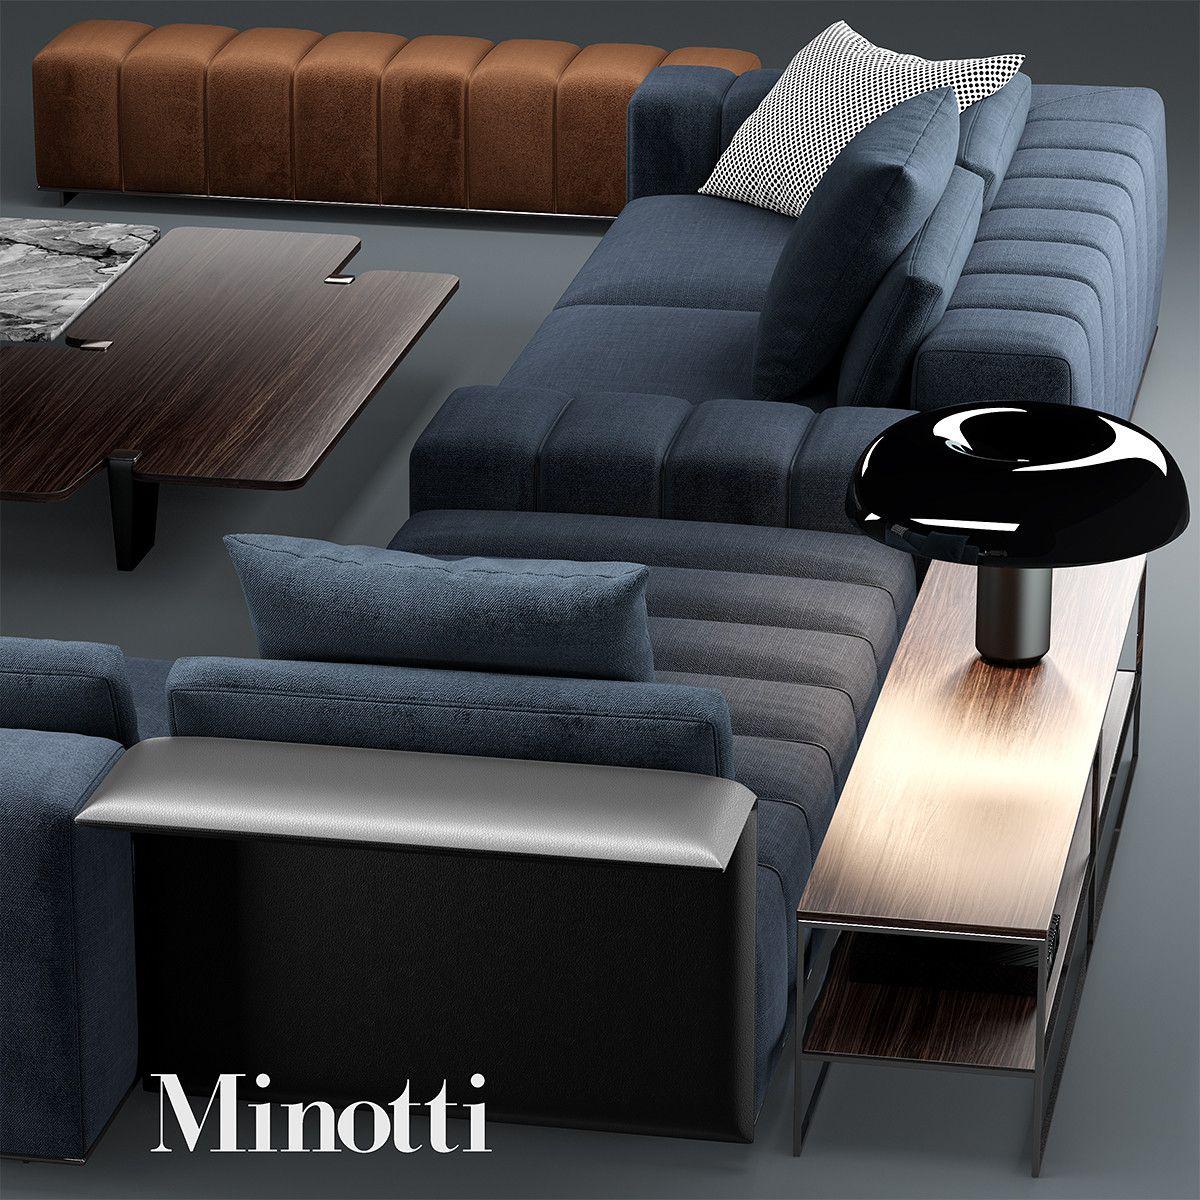 3d Sofa Minotti Freeman Model Living Room Sofa Design